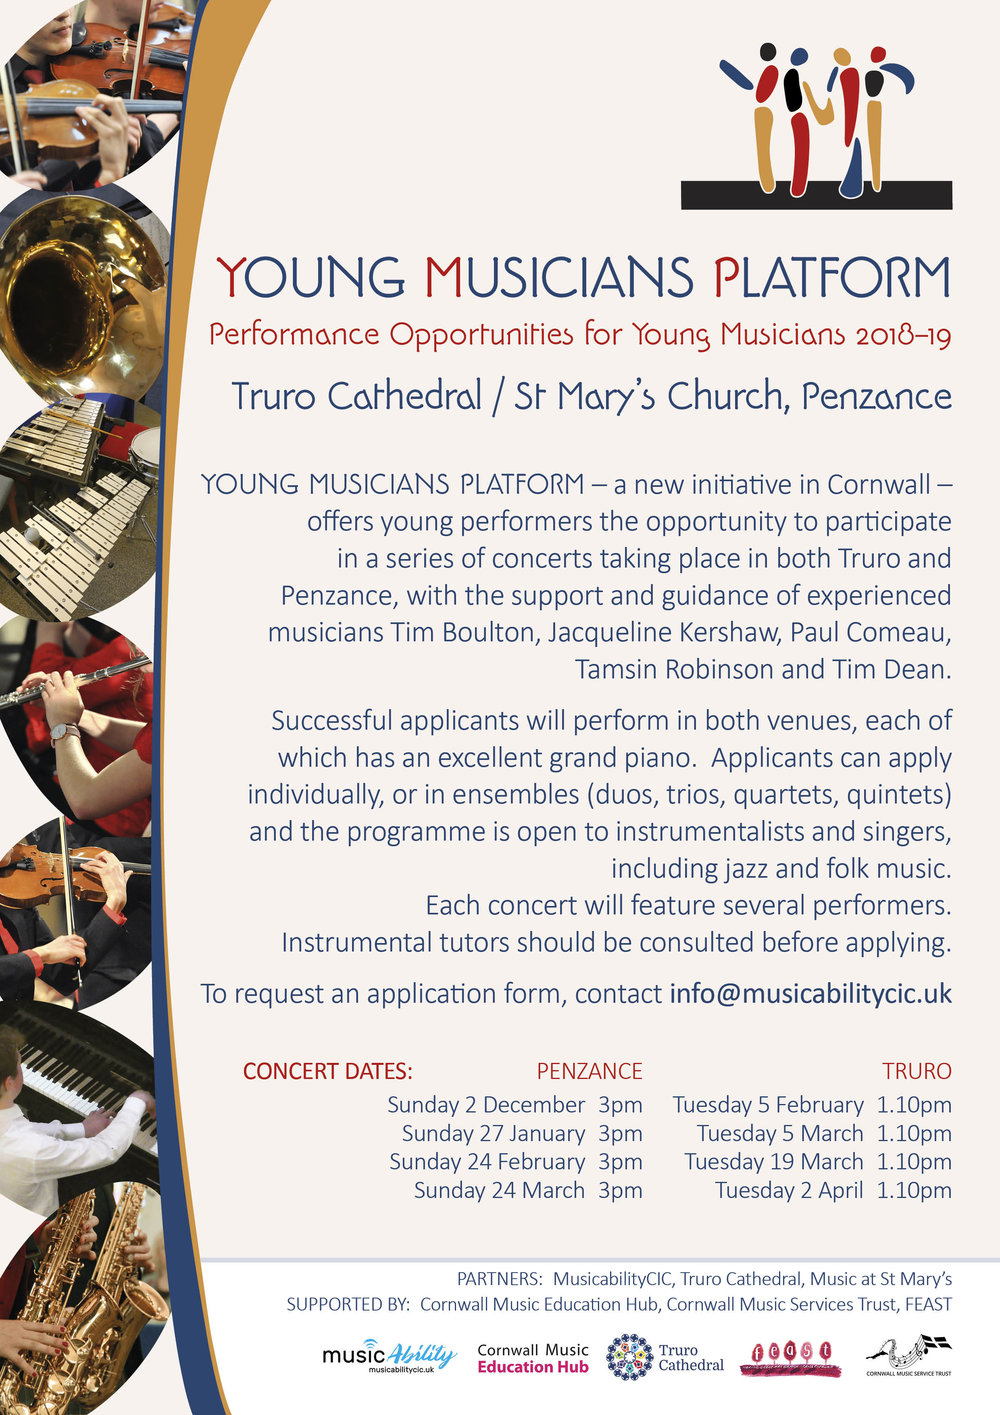 YoungMusiciansPlatform lflt A4 rgb i.jpg